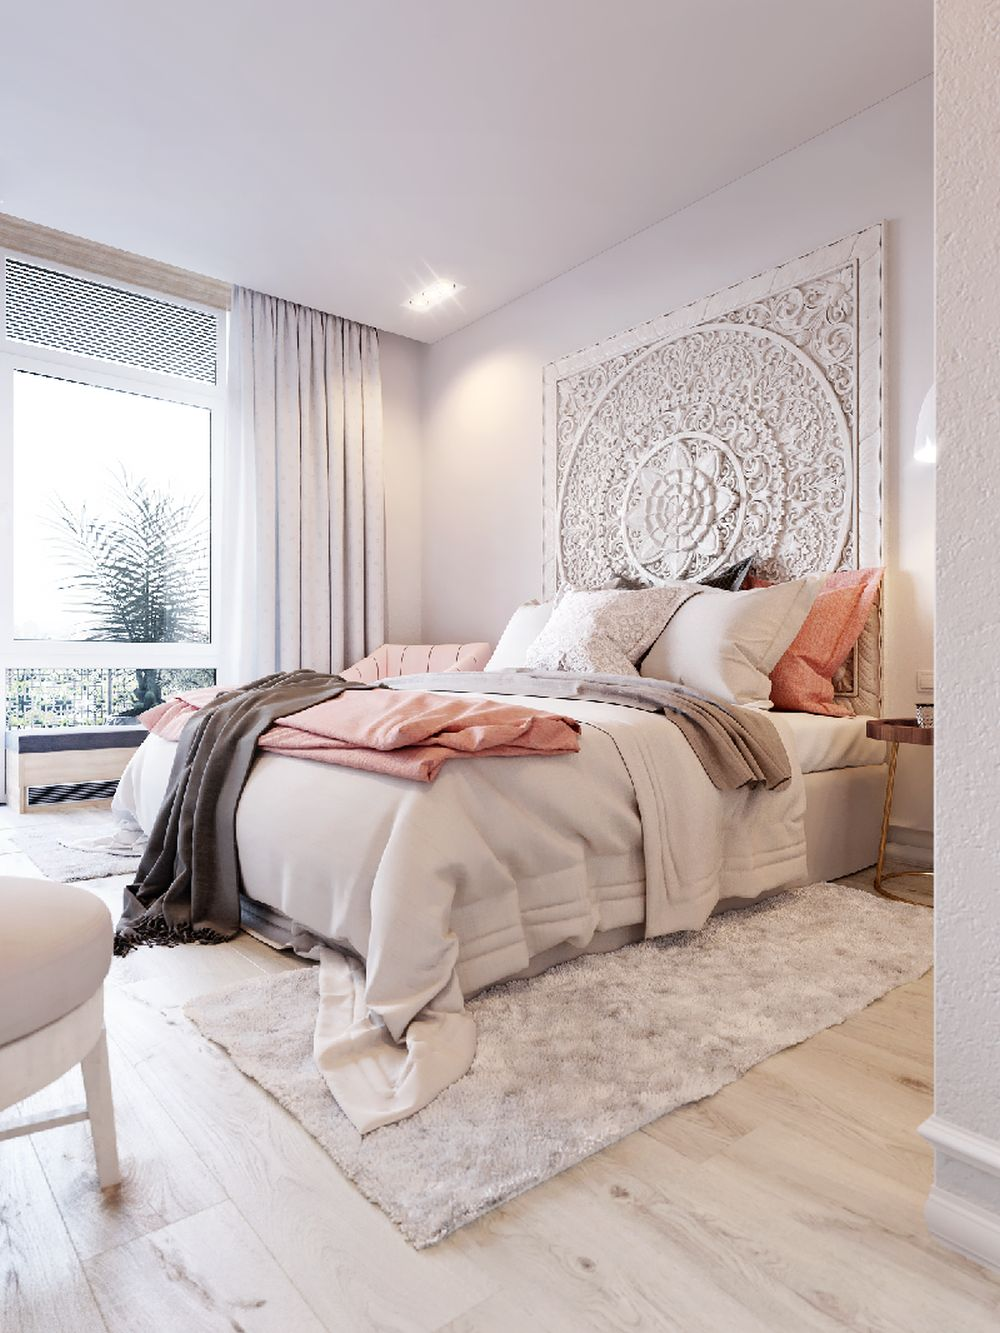 adelaparvu.com despre apartament in nuante delicate, designer Dima Kravtsov (13)